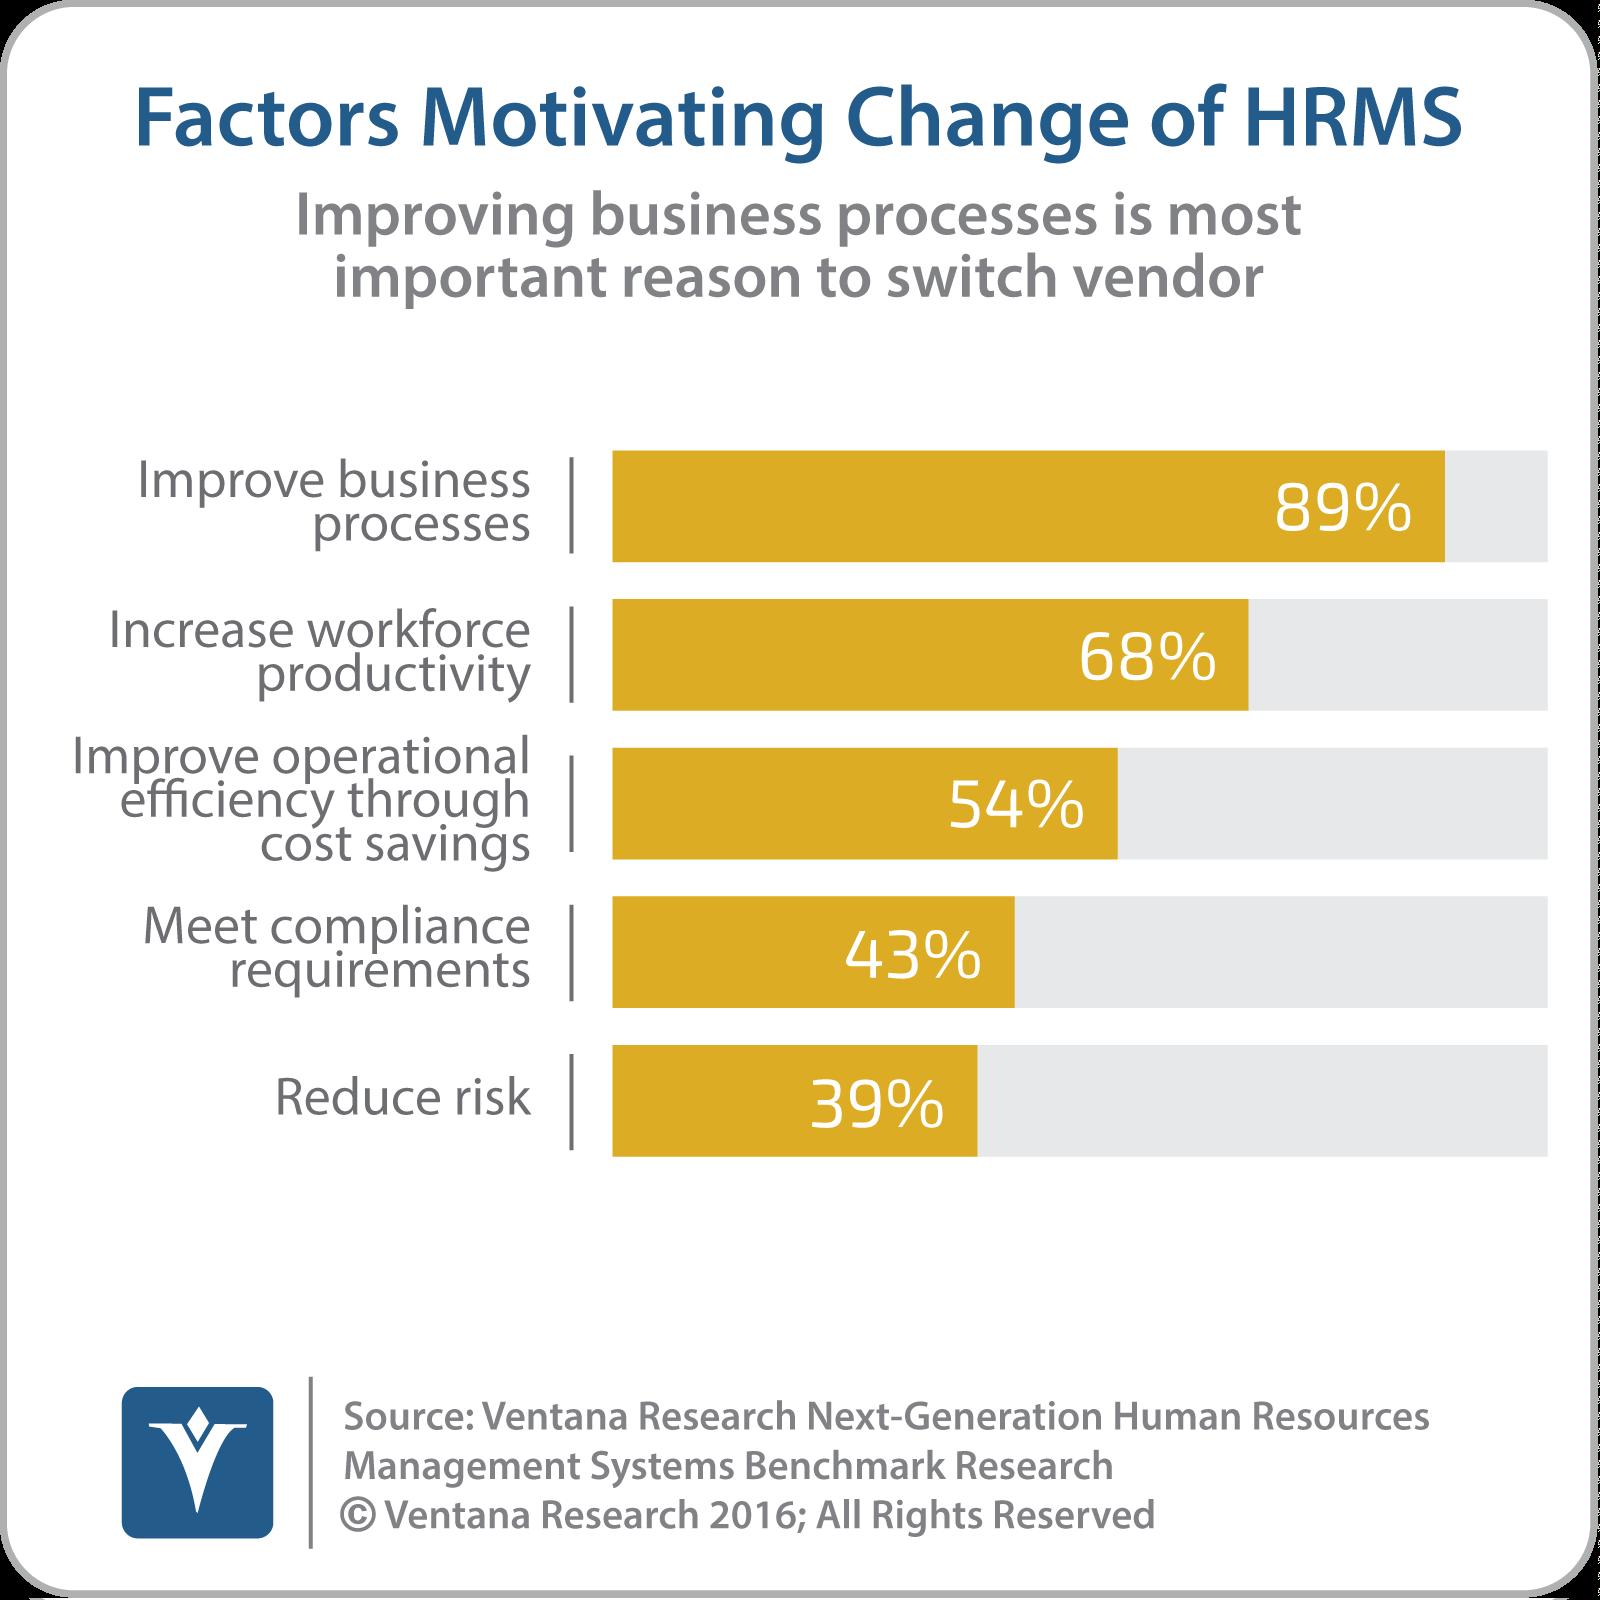 vr_HRMS_10_factors_motivating_change_of_HRMS_lg-1